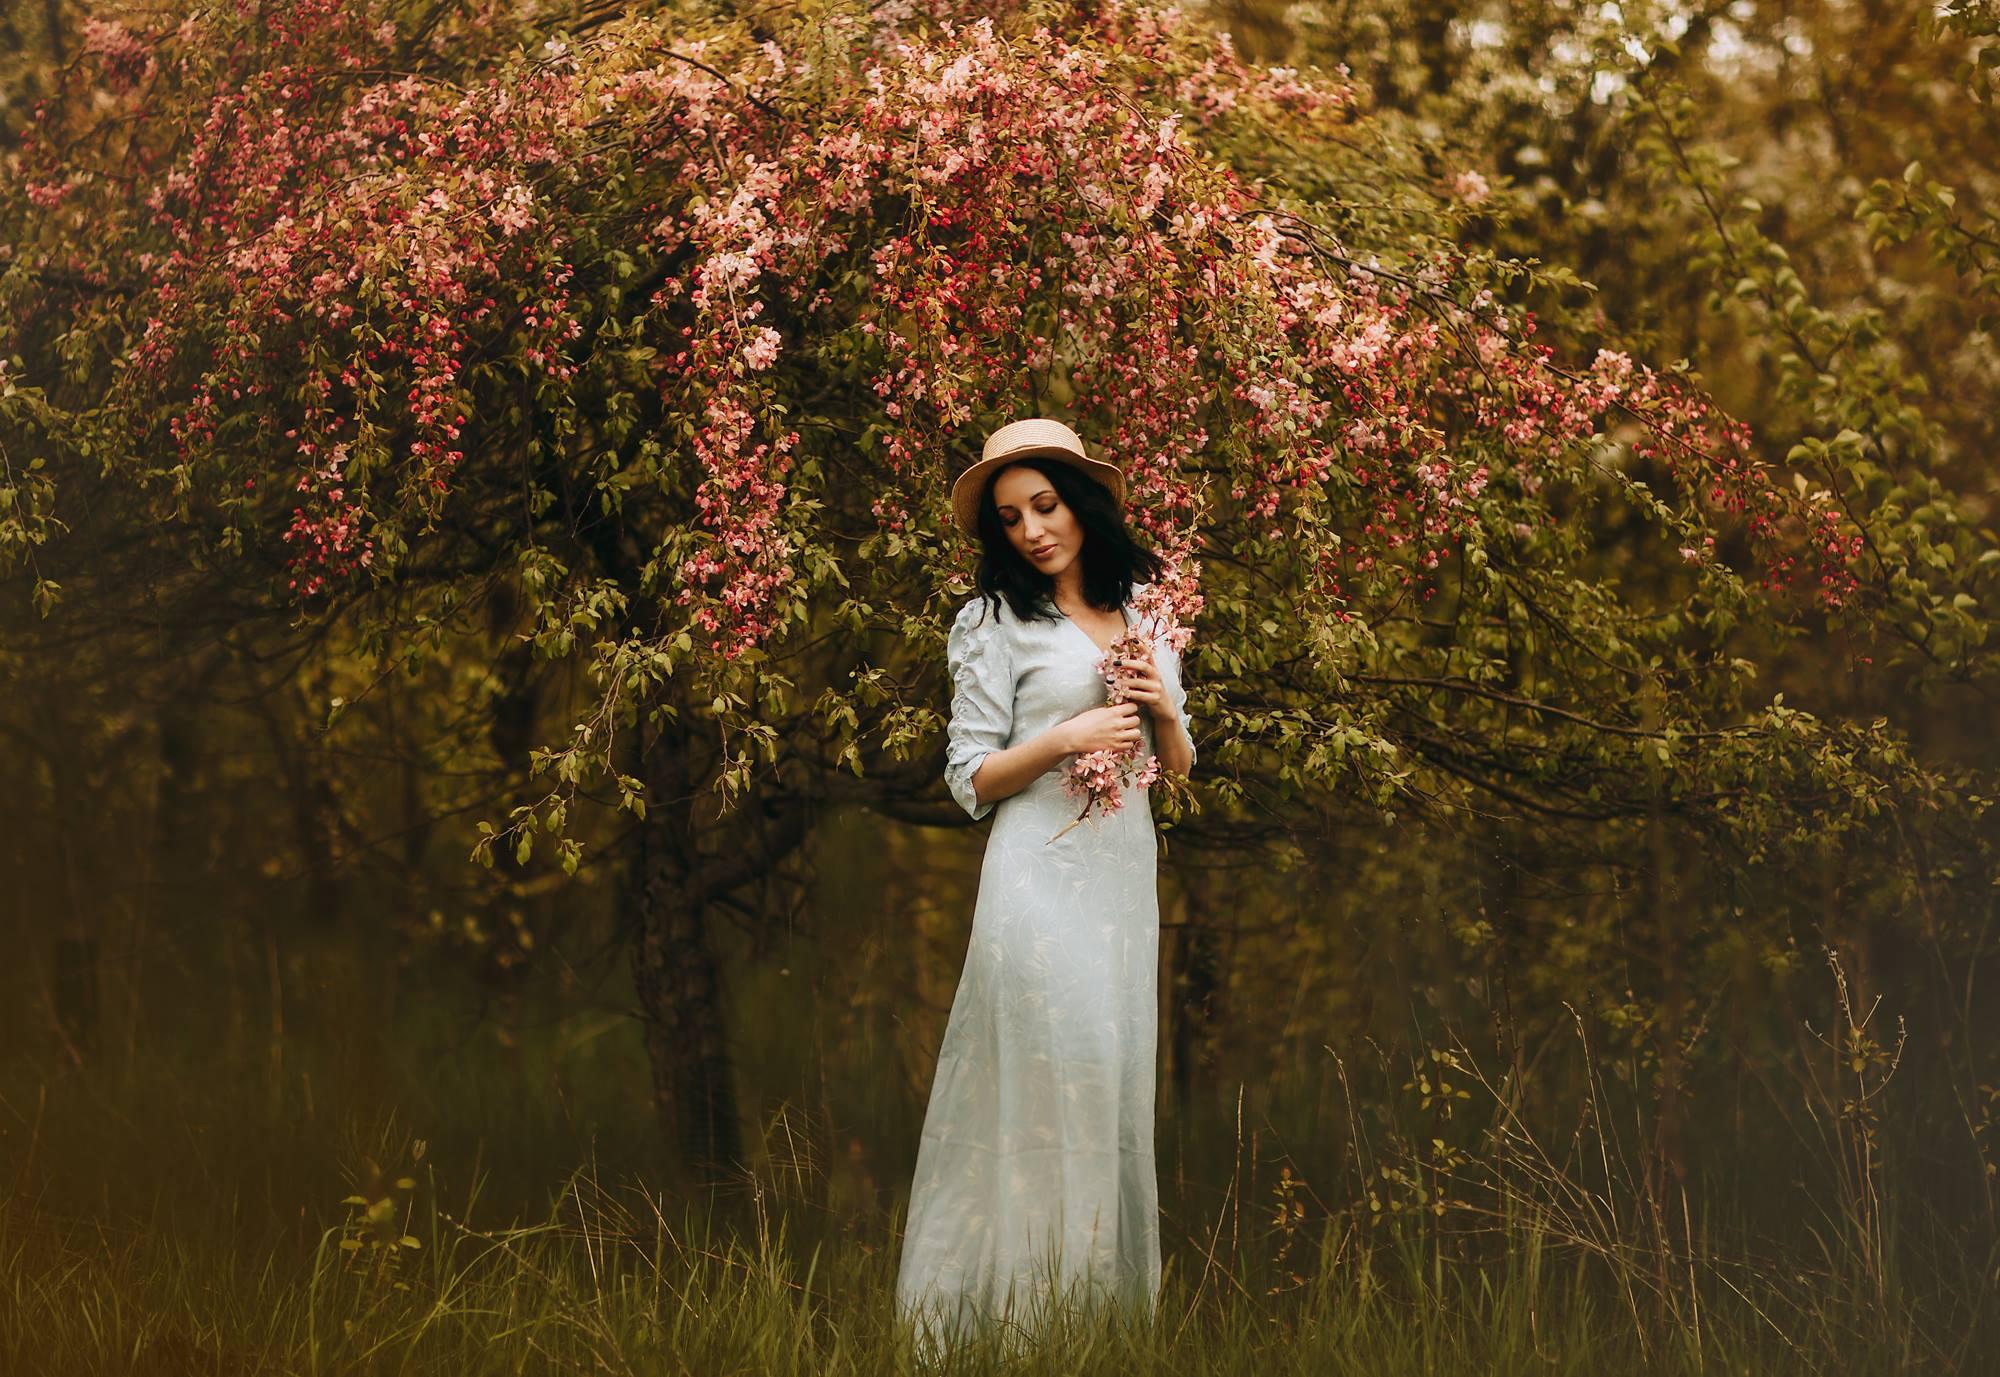 alina alley 2 - Emotional Storytelling with Twyla Jones - Wildest Dreams.jpg